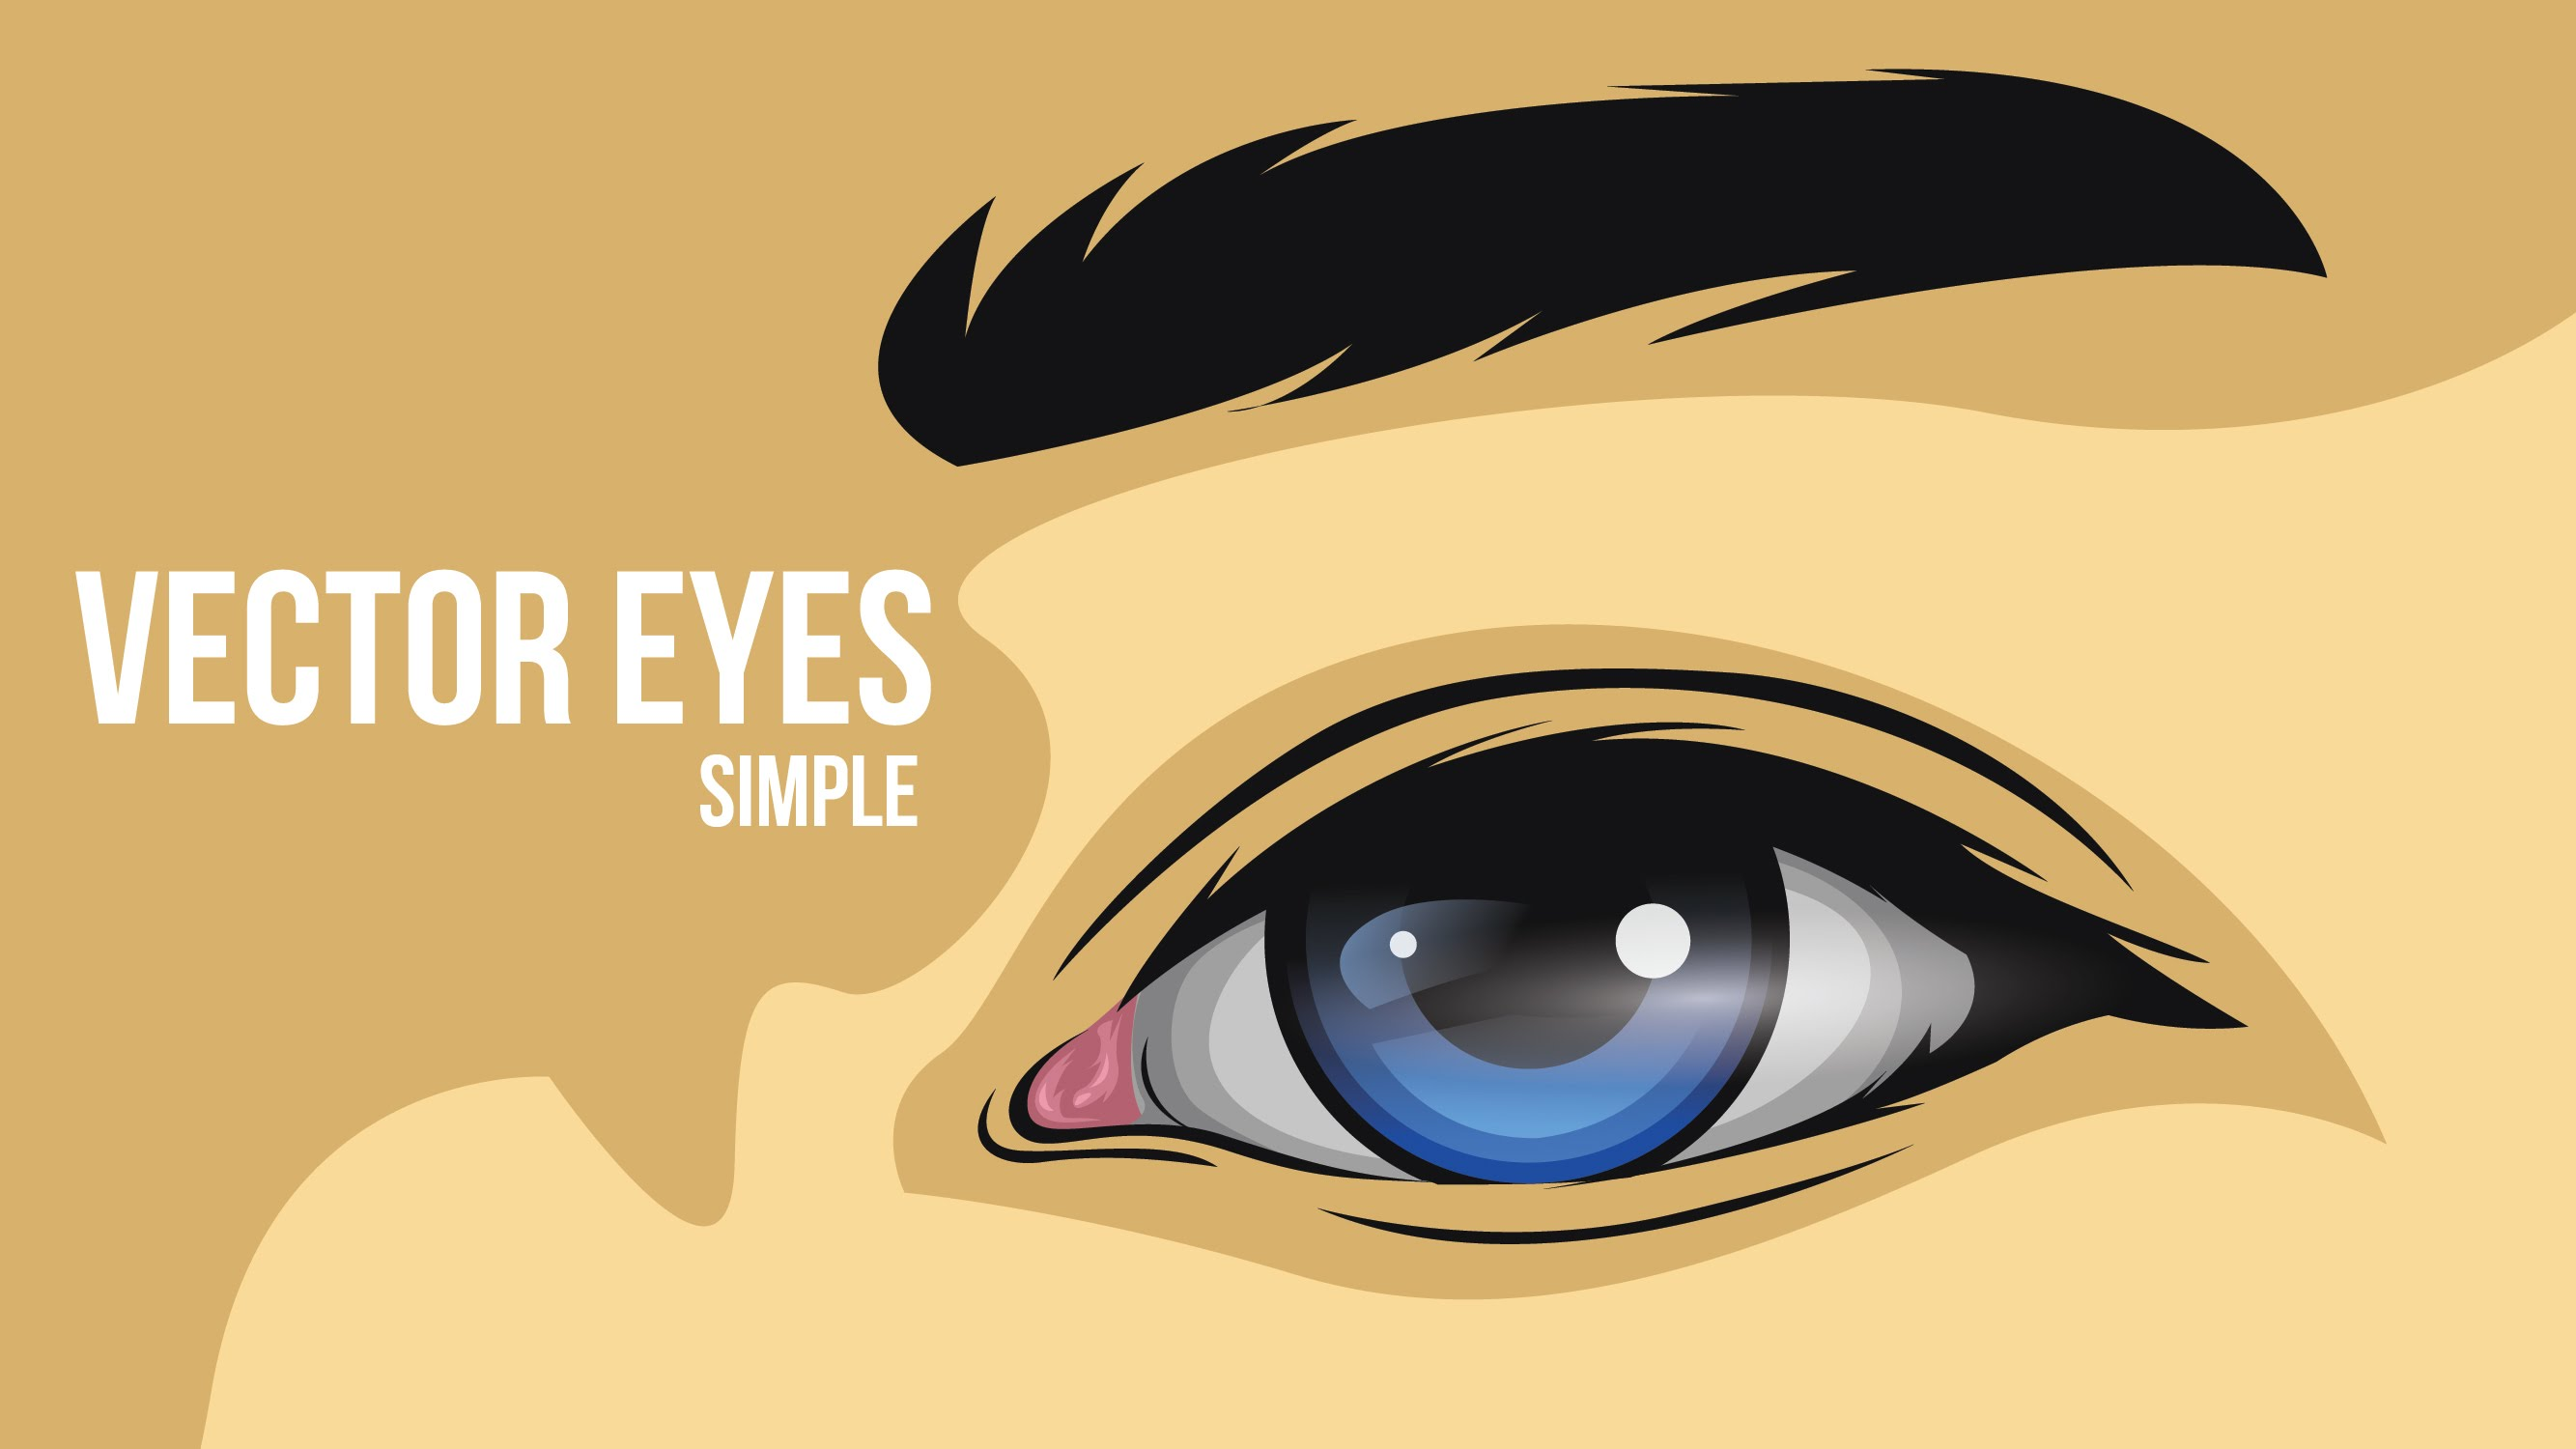 2667x1500 How To Create A Simple Eye Vector